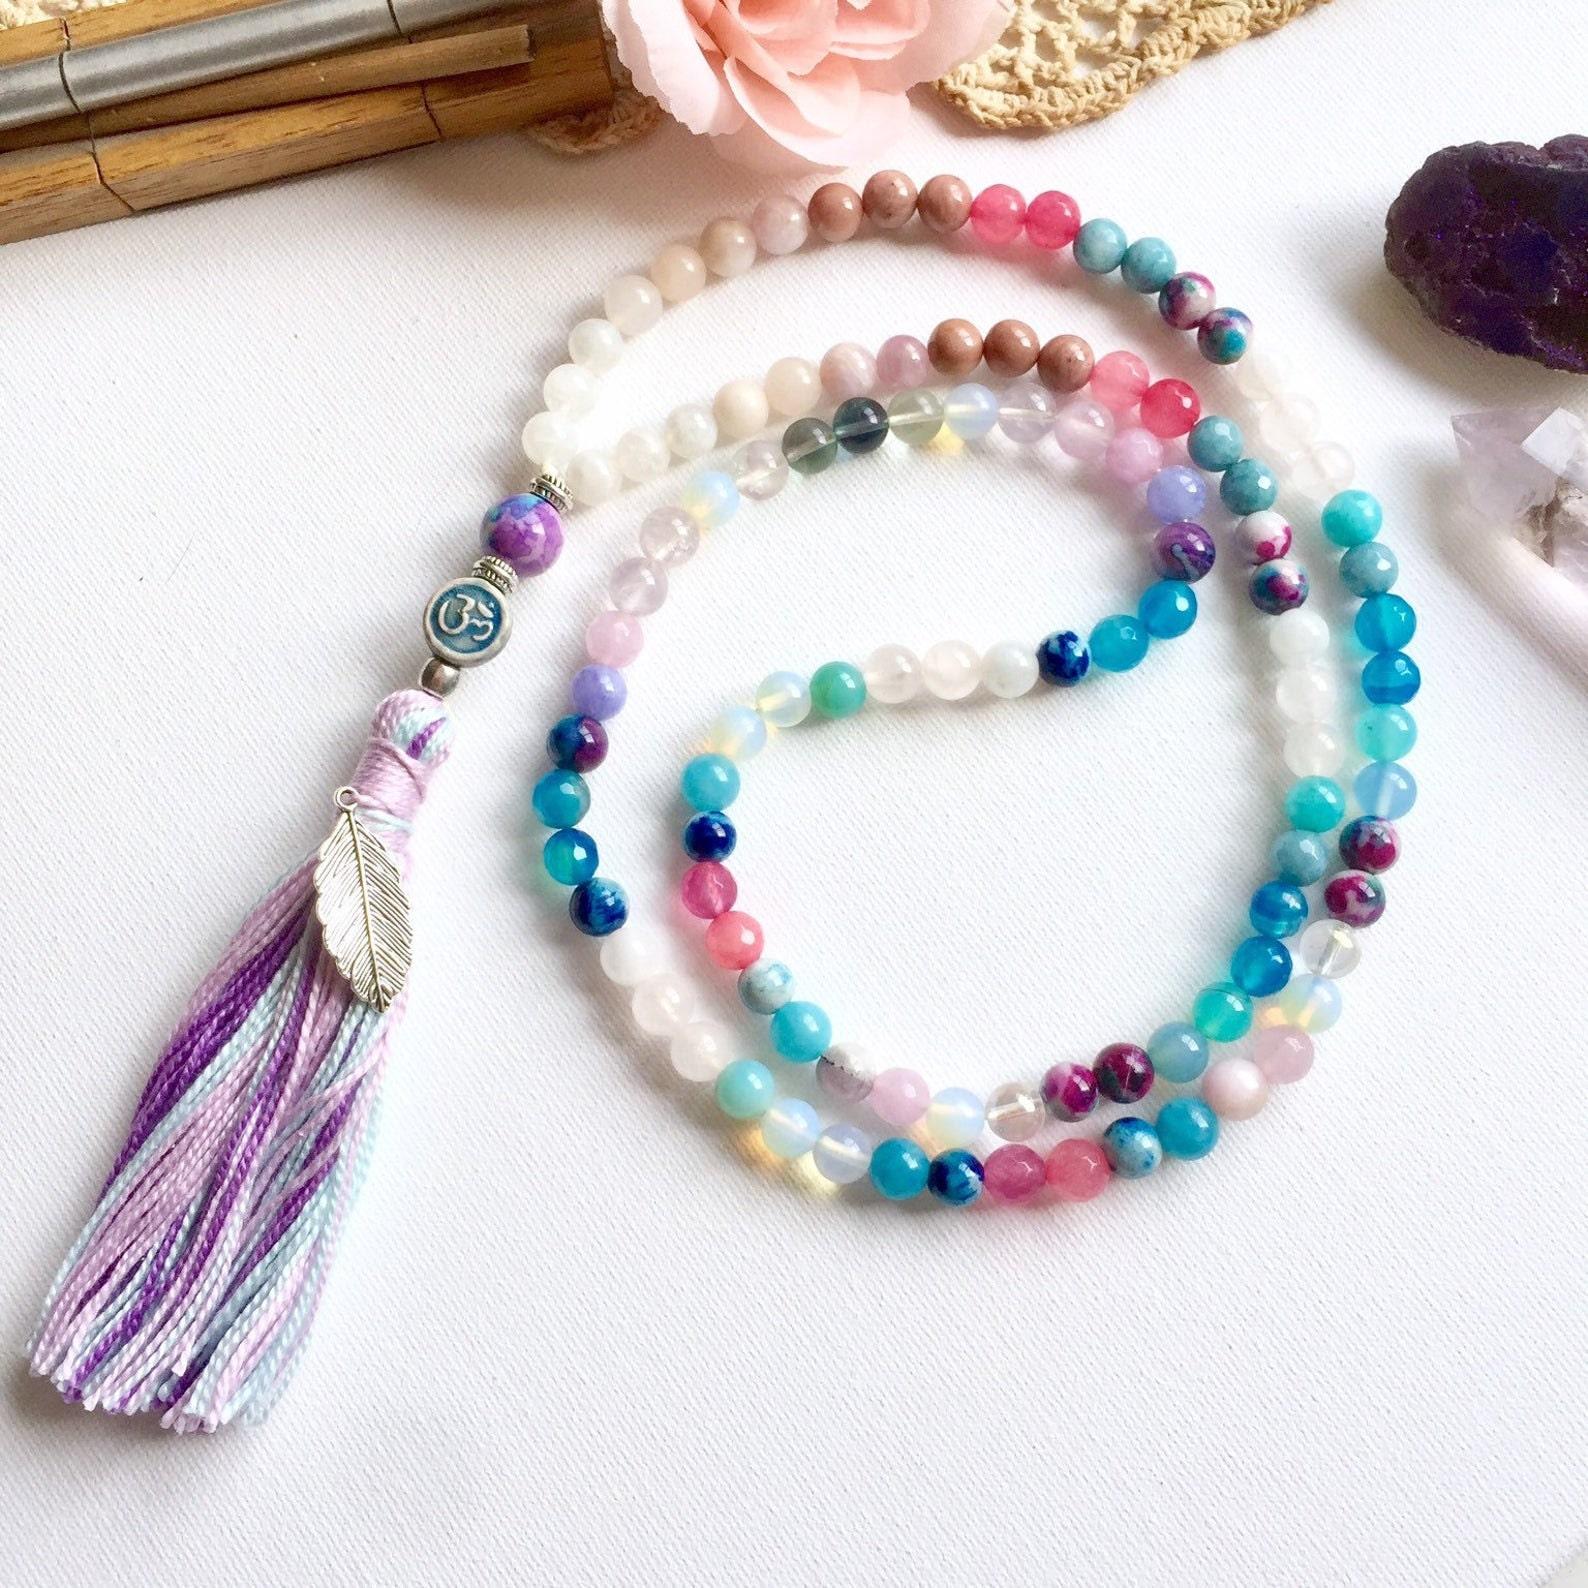 ananda japa mala necklace by kandy disenos